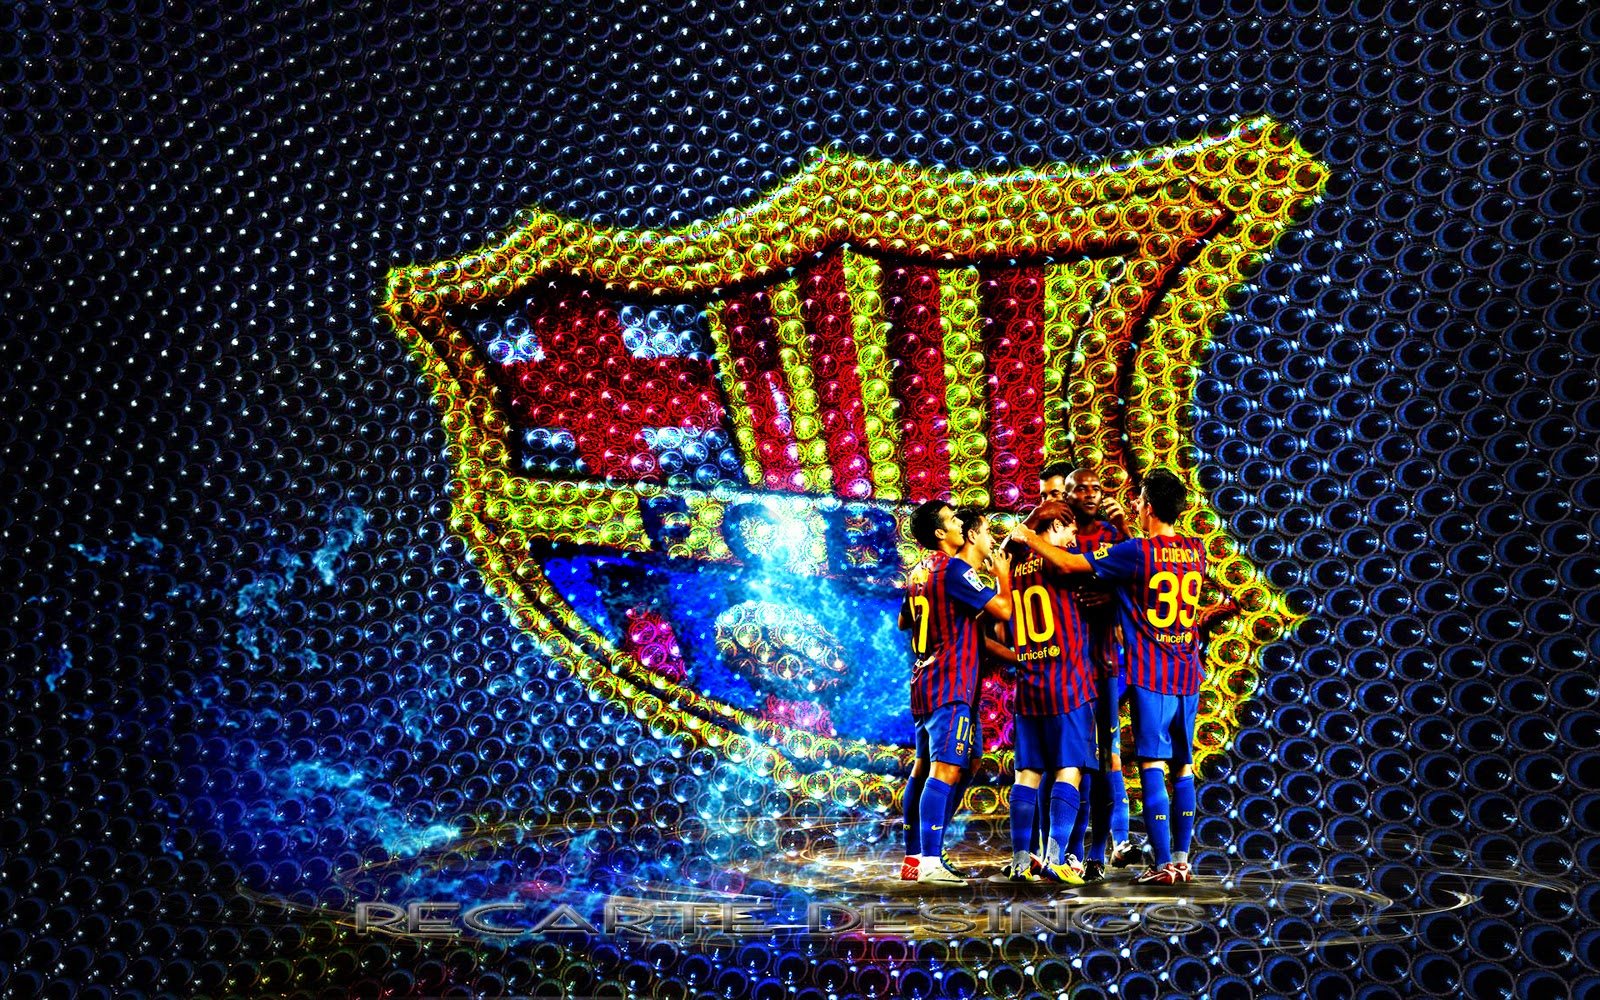 Barcelona Wallpaper Iphone 6 Barcelona Football Club Wallpaper Football Wallpaper Hd